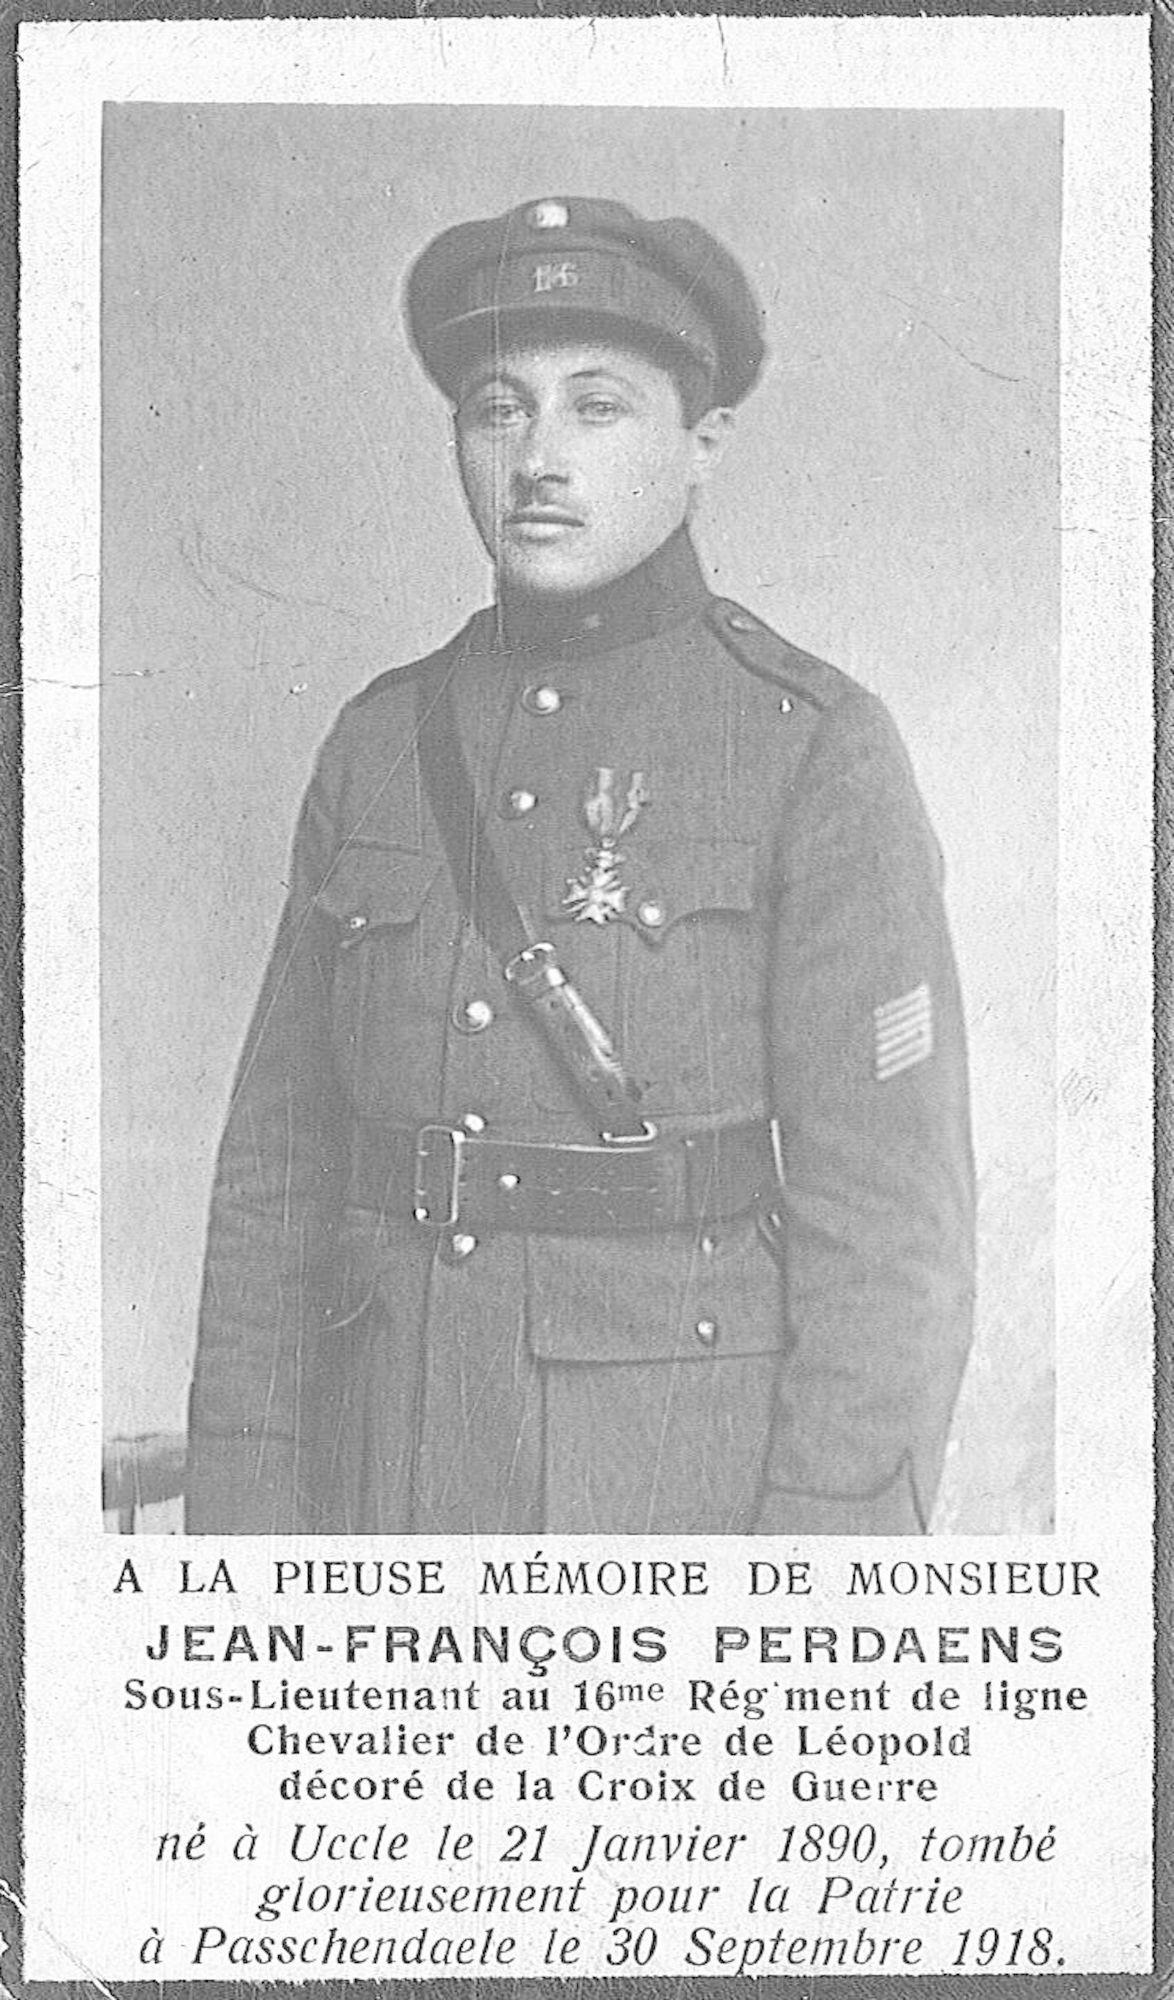 Jean-François Perdaens